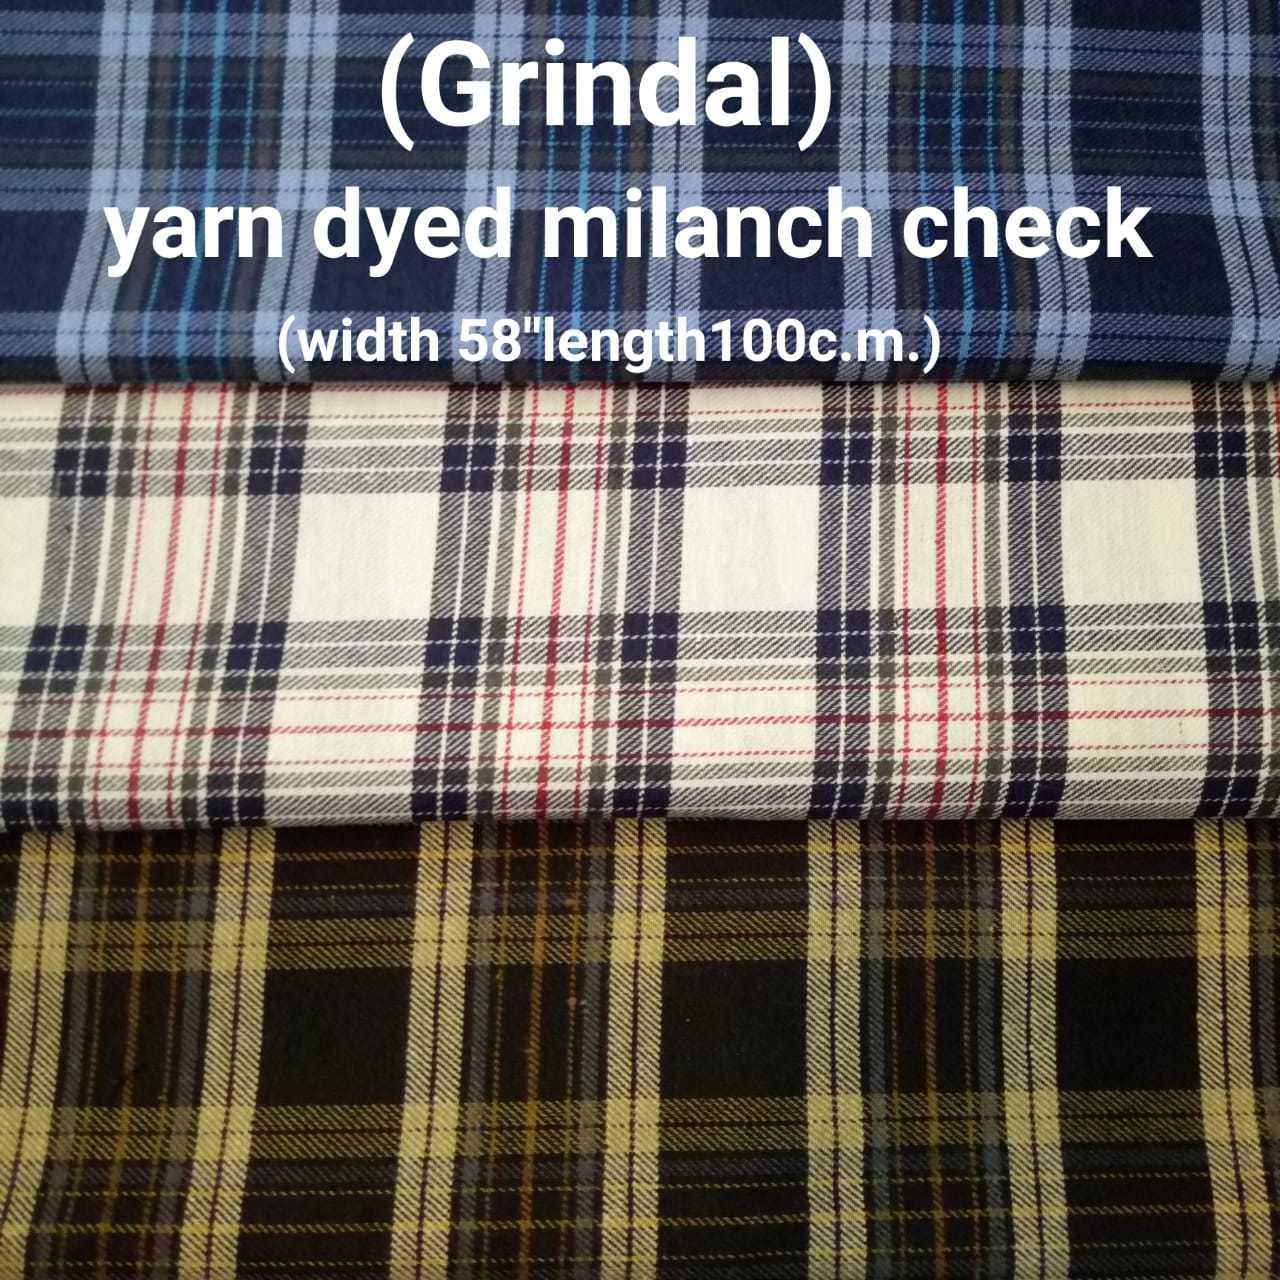 Grindal yarn dyed